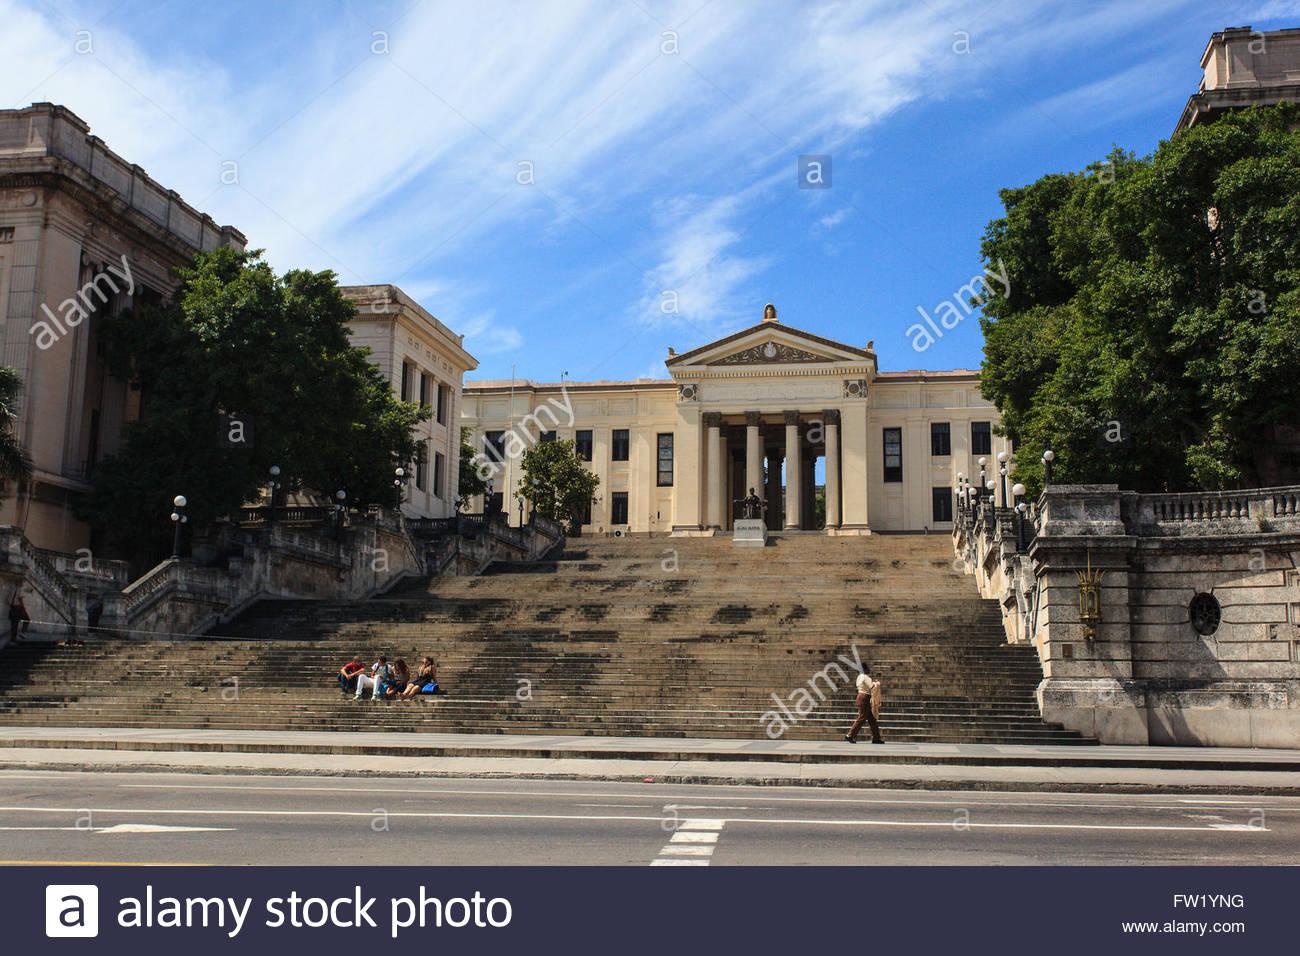 The University of Havana or UH (in Spanish, Universidad de La Habana) is a university located in the Vedado district - Stock Image